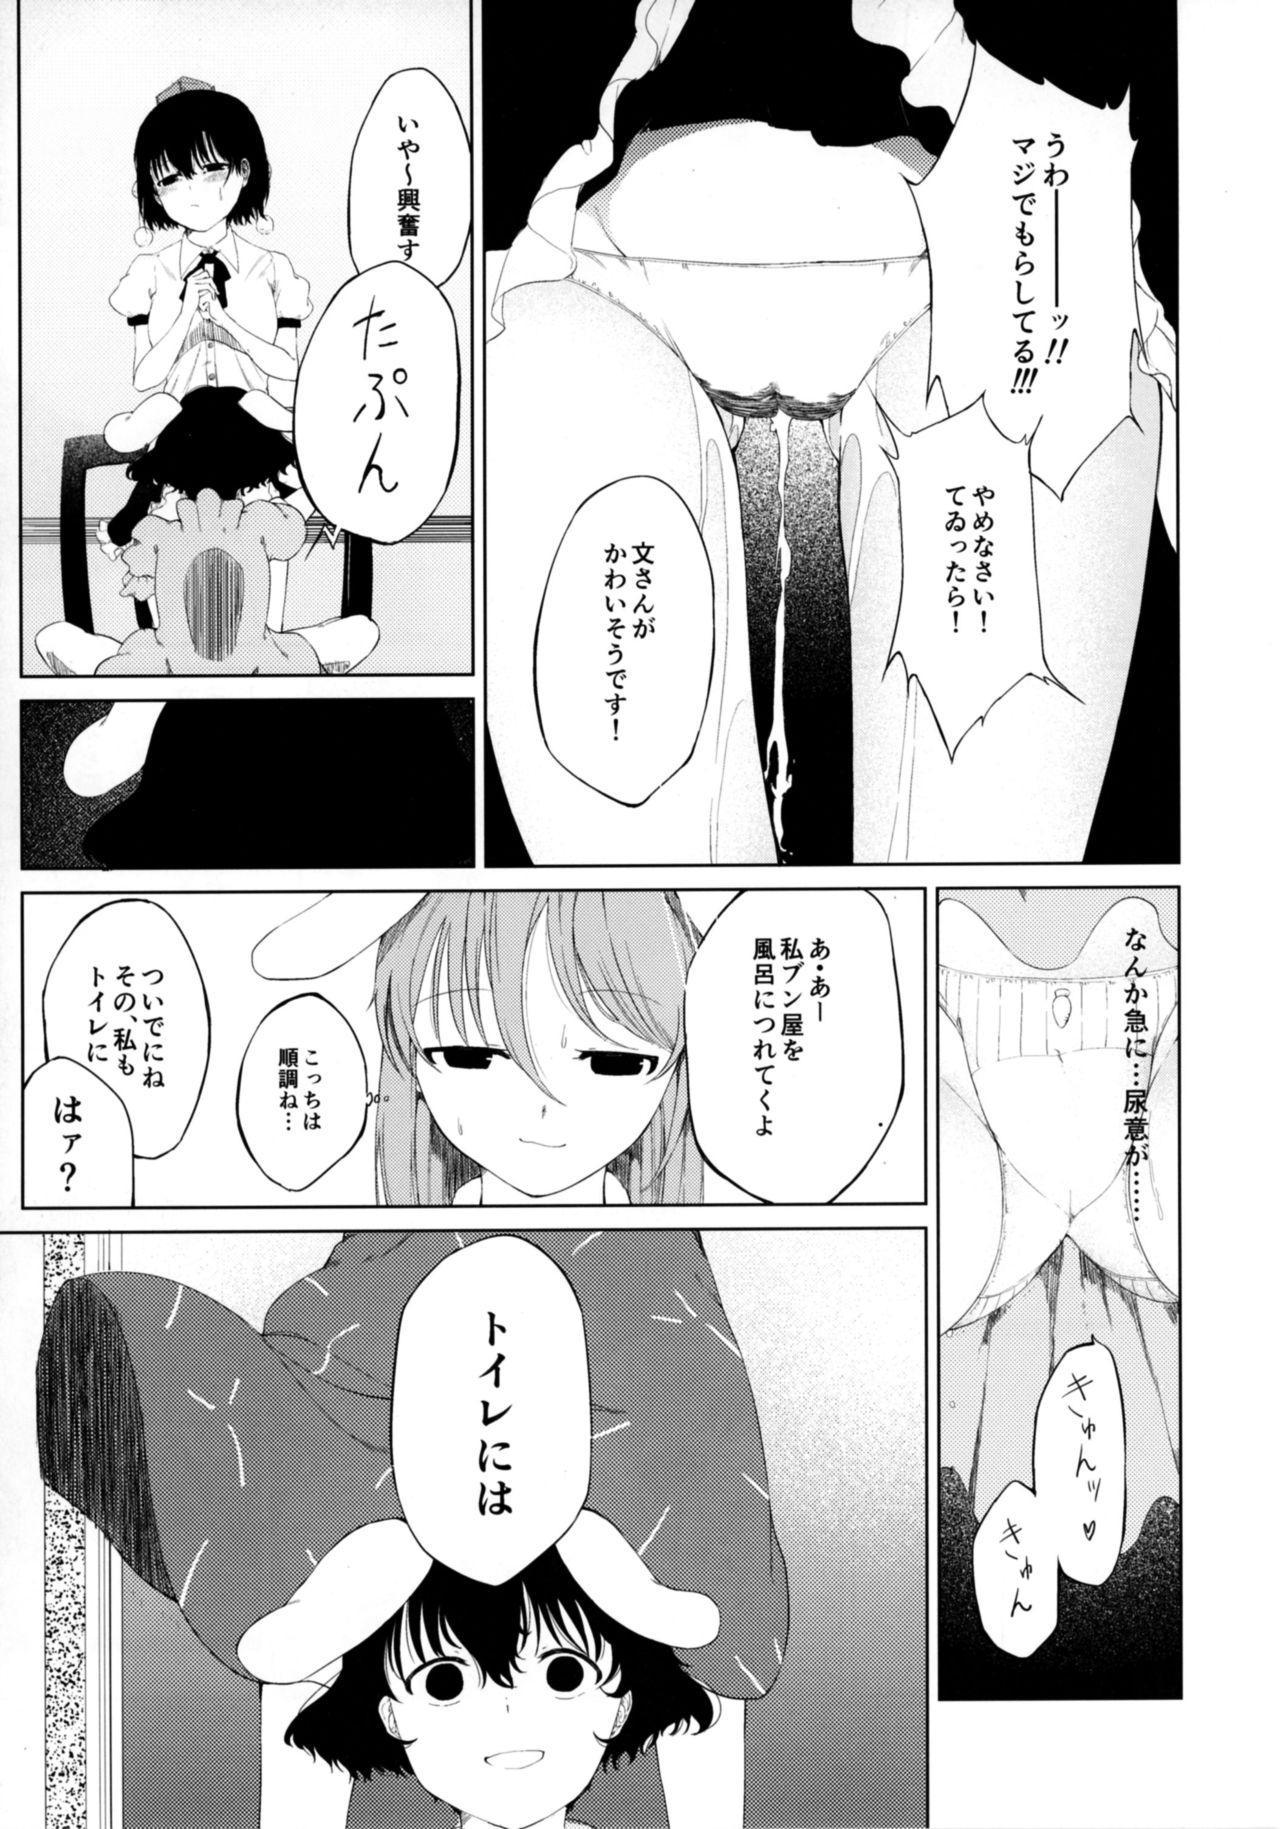 Aya to Tewi to Sanae to Udonge ga Omorashi Suru Hon!! 14